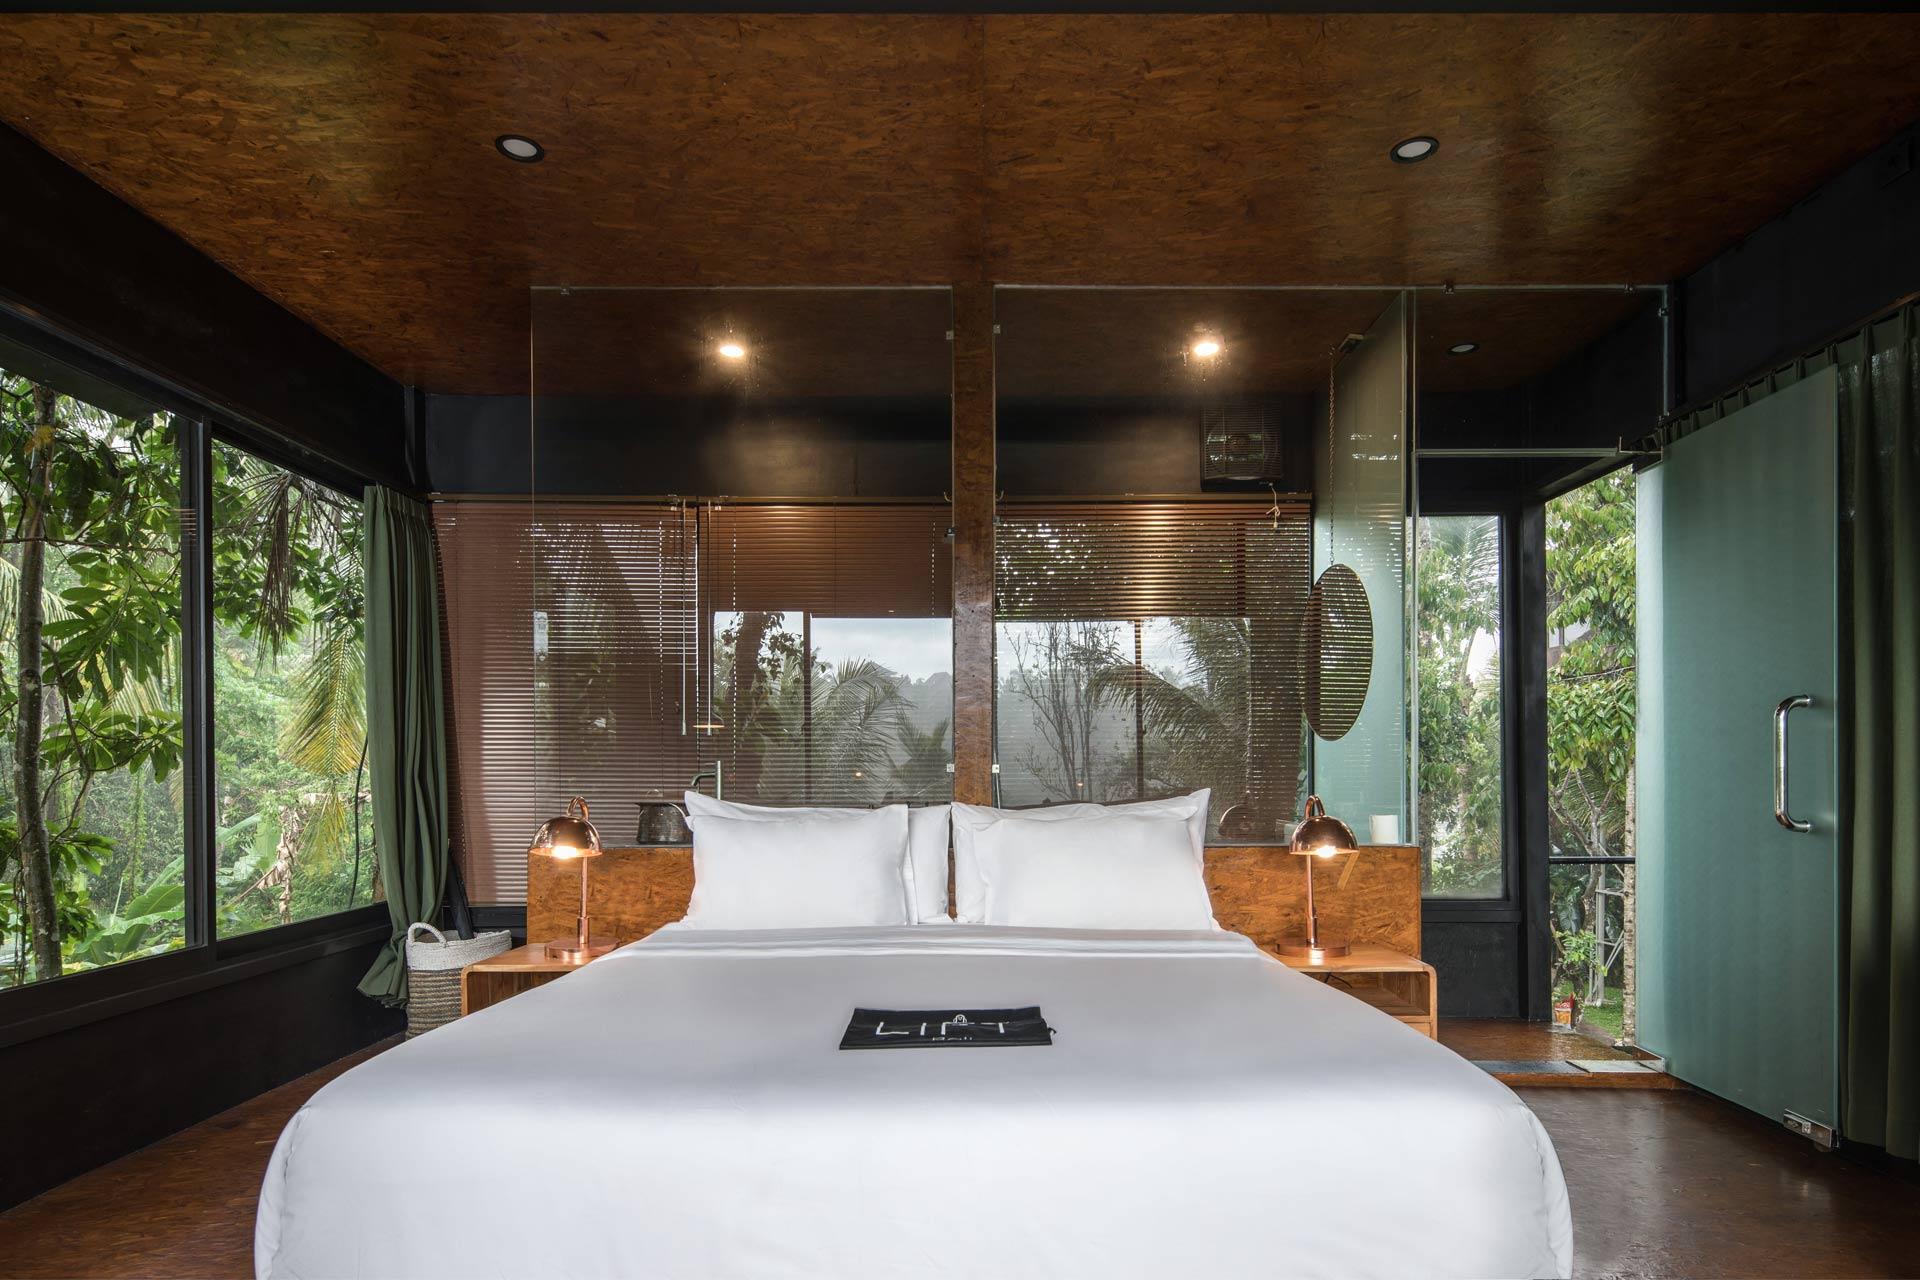 Lift Bali in Ubud